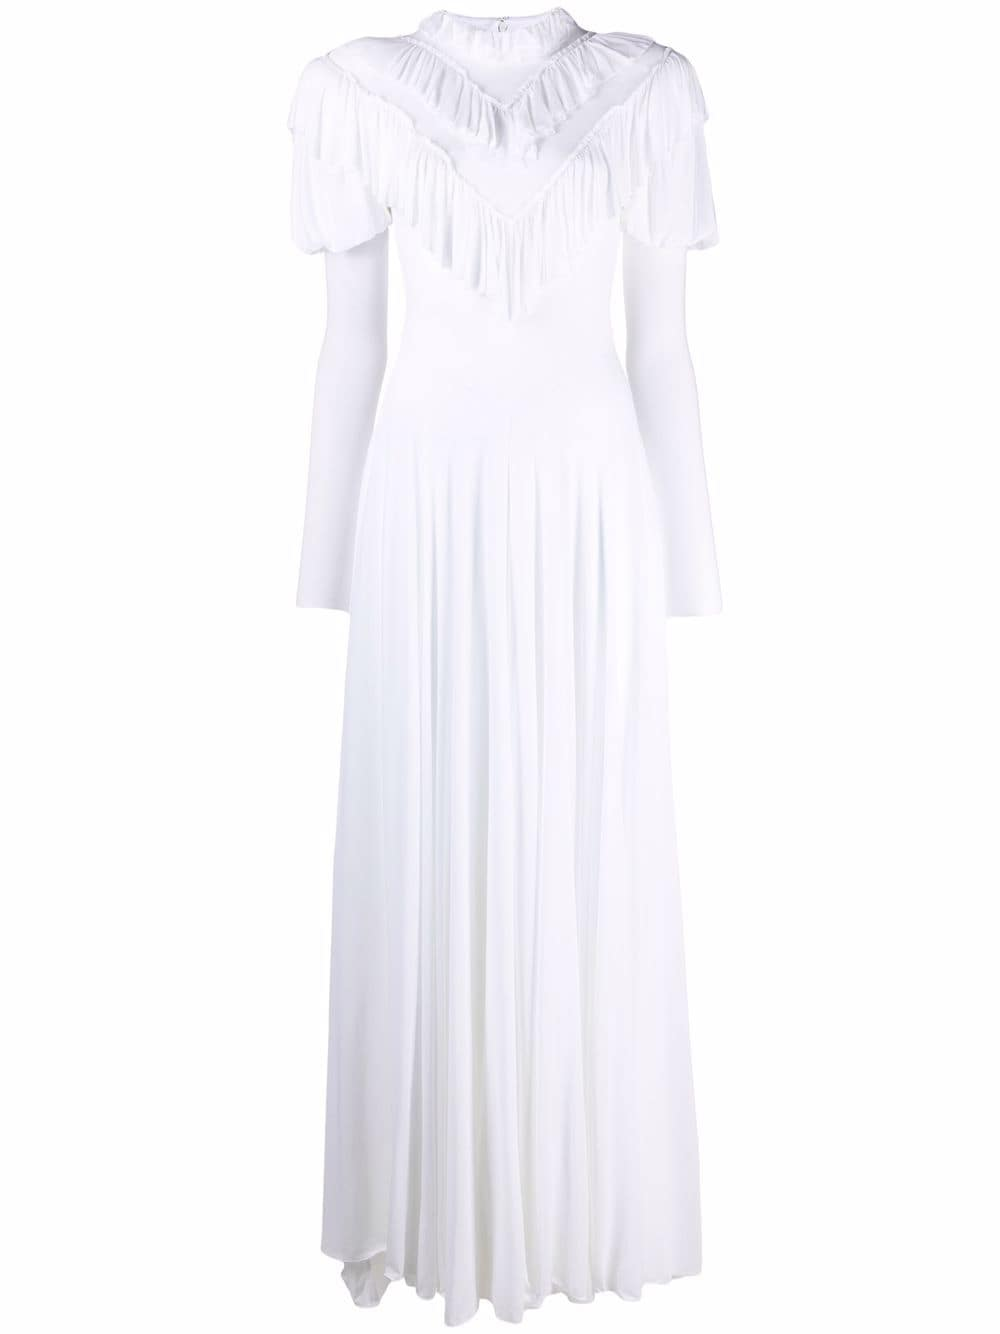 PHILOSOPHY di LORENZO SERAFINI | Dress | A042457341